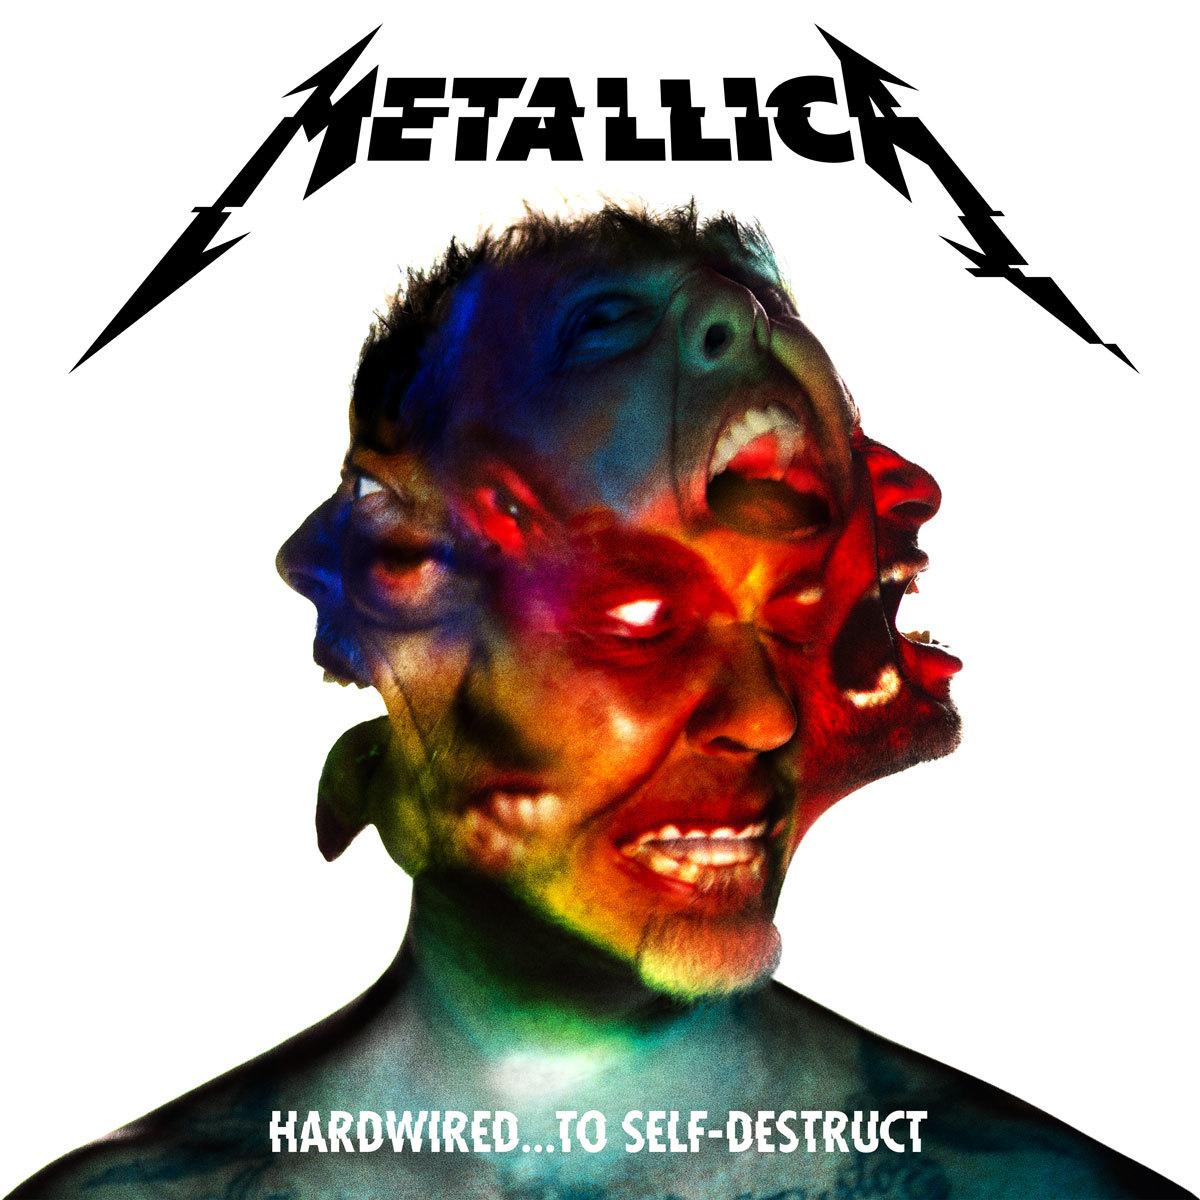 https://2.bp.blogspot.com/-rwb1JeNn21g/V7Y1rbUpTrI/AAAAAAAAnjA/3c4JE2SE1sYWTLnx5oxLDLouJGICmraQgCLcB/s1600/Metallica.Hardwired%2BTo%2BSelf%2BDestruct.2016.jpeg